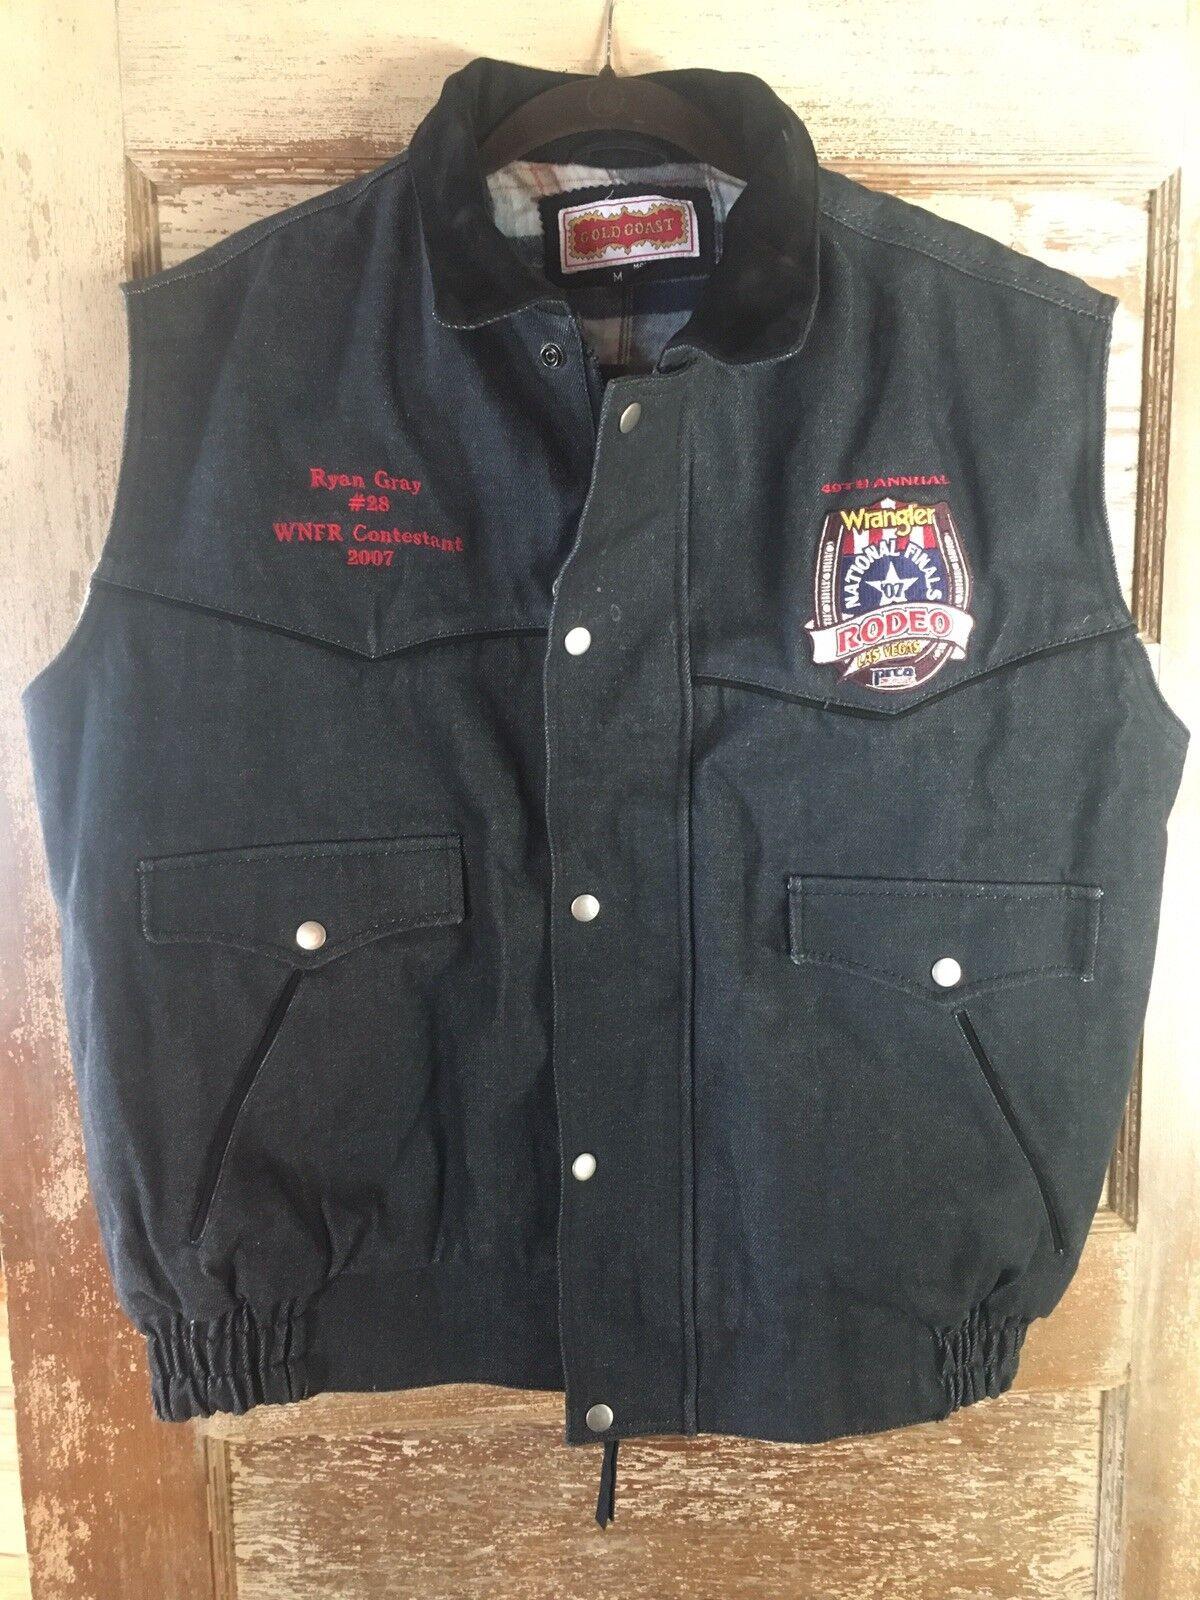 2007 wnfr concursante Tela de de de Jeans Chaleco Bareback Rider Ryan gris PRCA Rodeo NFR Vegas 170385